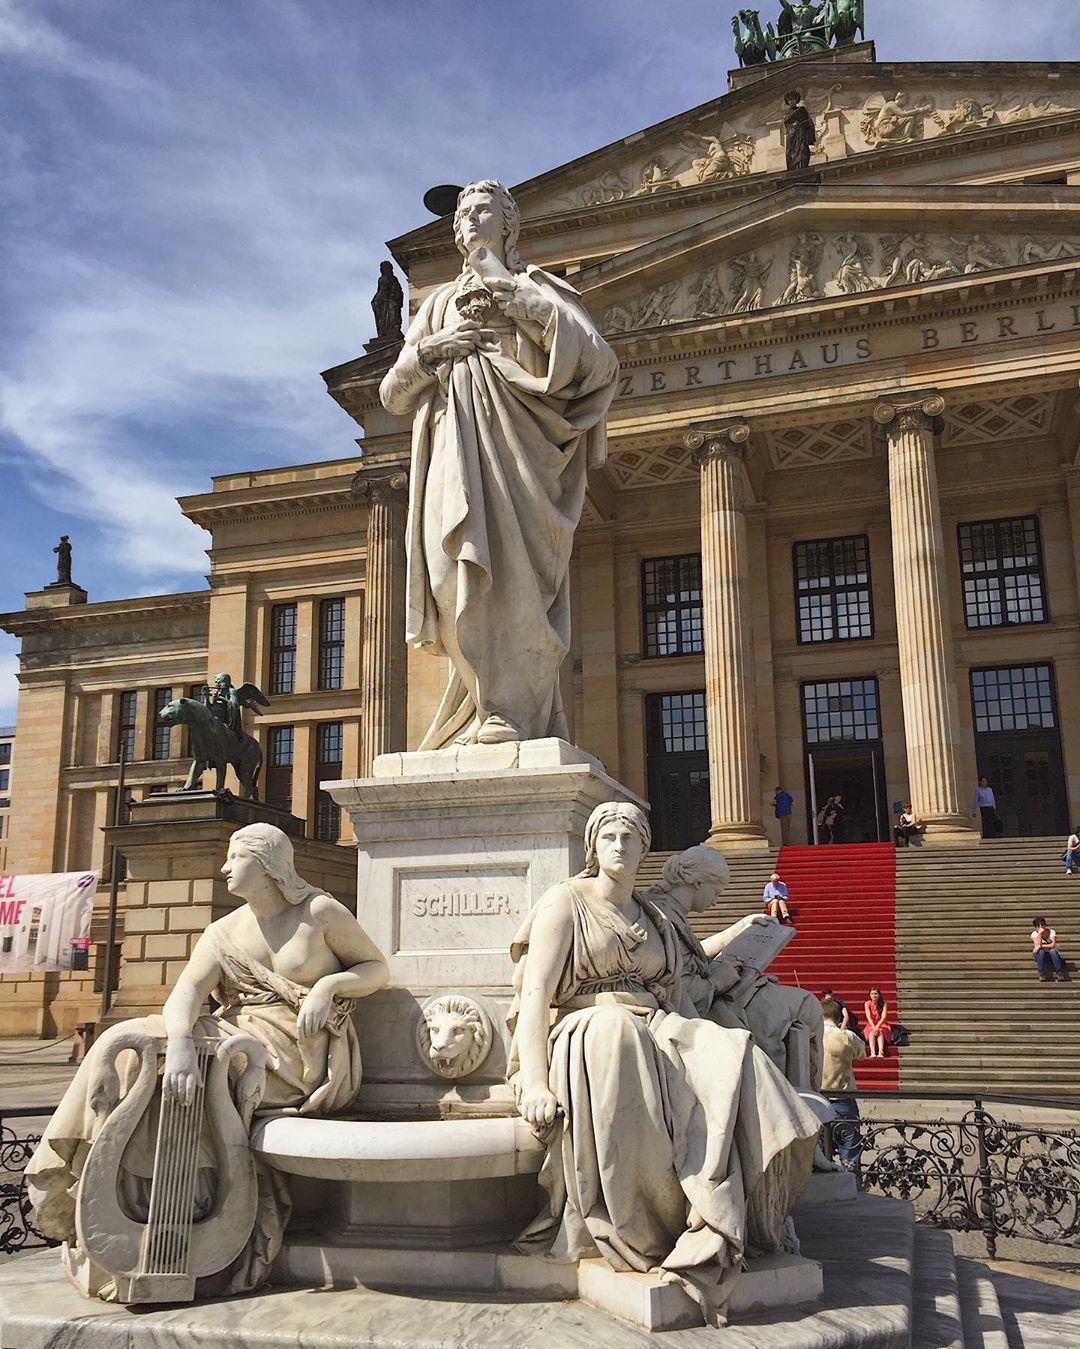 Berlin Master Architect S Neoclassical Masterpiece The Konzerthaus At Gendarmenmarkt Pizzosdoberlin Berlin Berlinstagr Statue Instagram Greek Statue